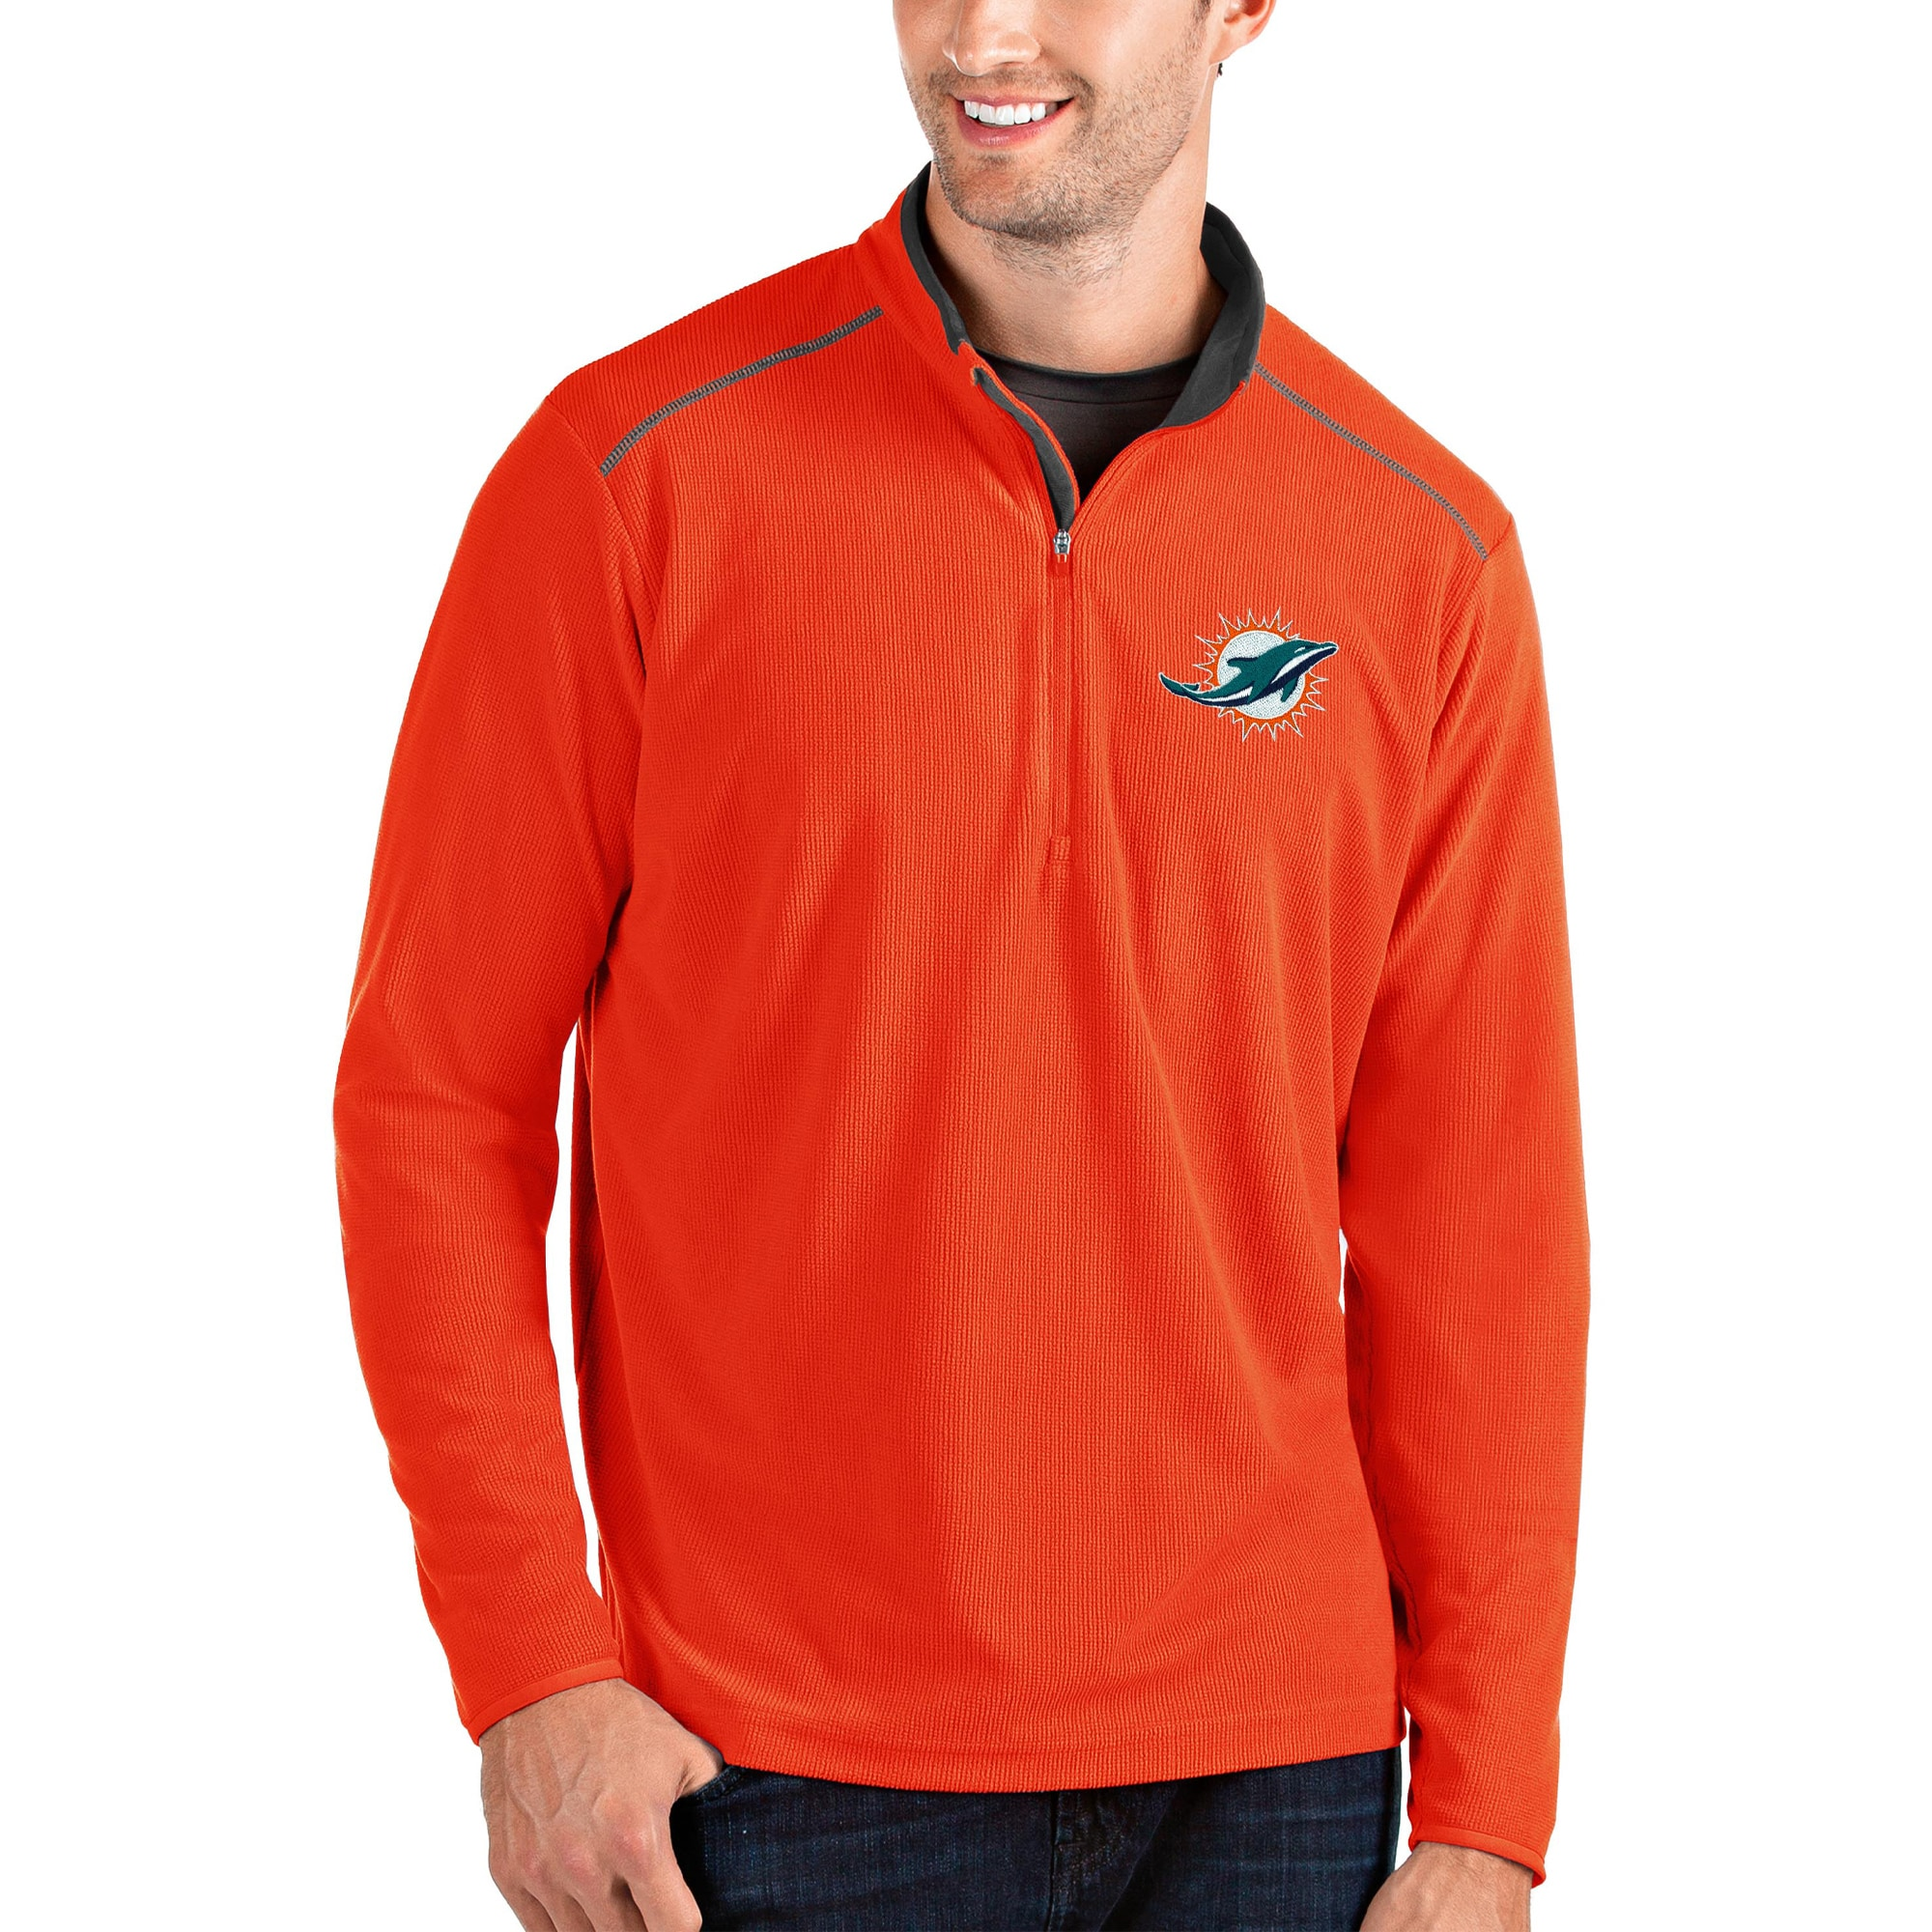 Miami Dolphins Antigua Glacier Quarter-Zip Pullover Jacket - Orange/Gray